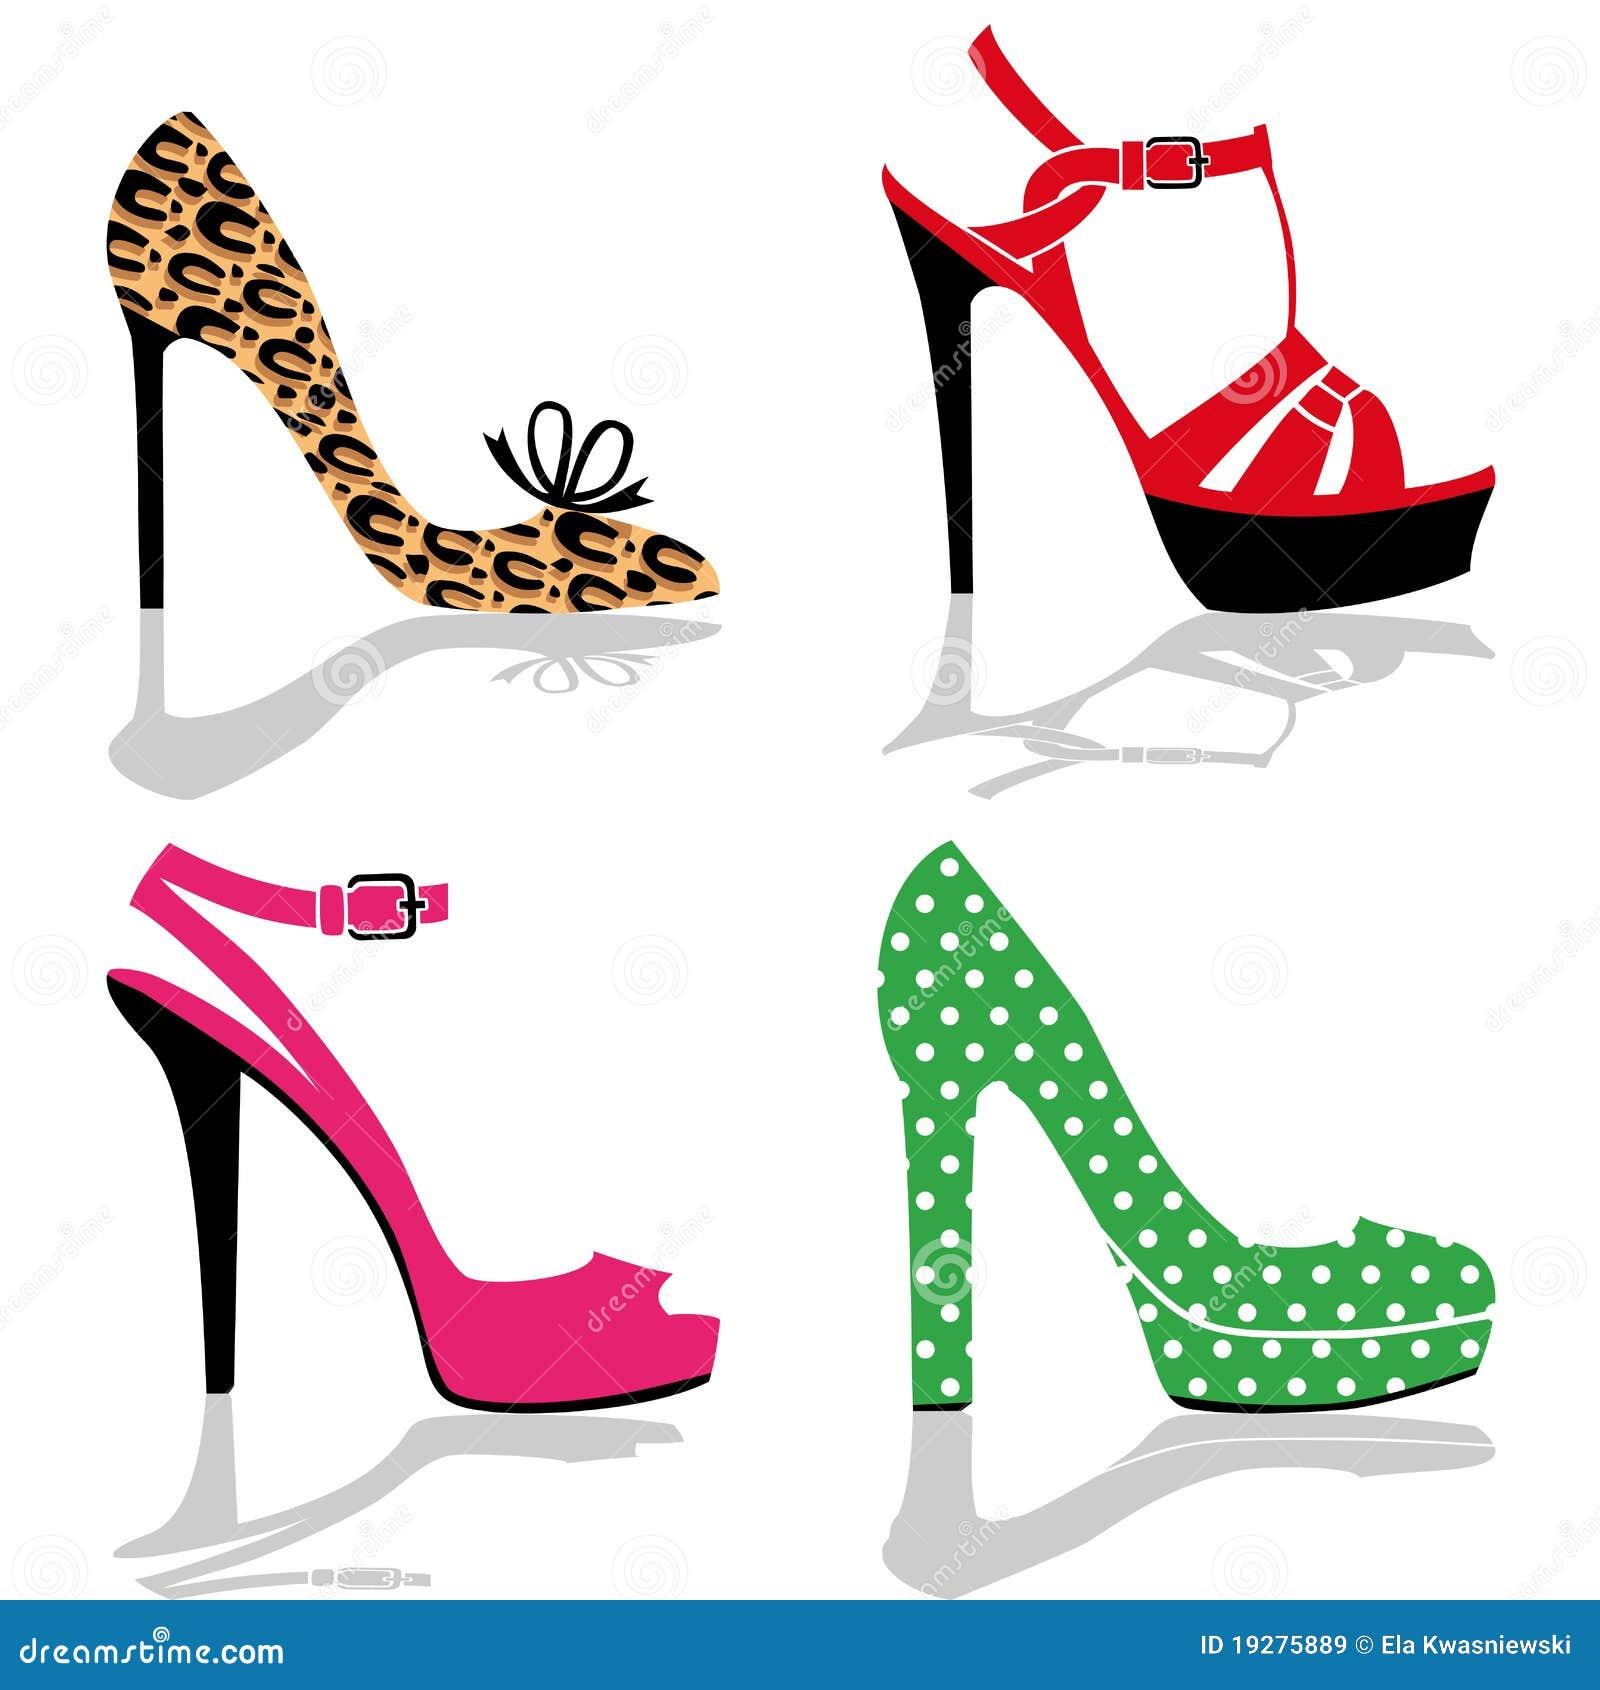 ad5ce911de Women shoe collection stock vector. Illustration of walking - 19275889